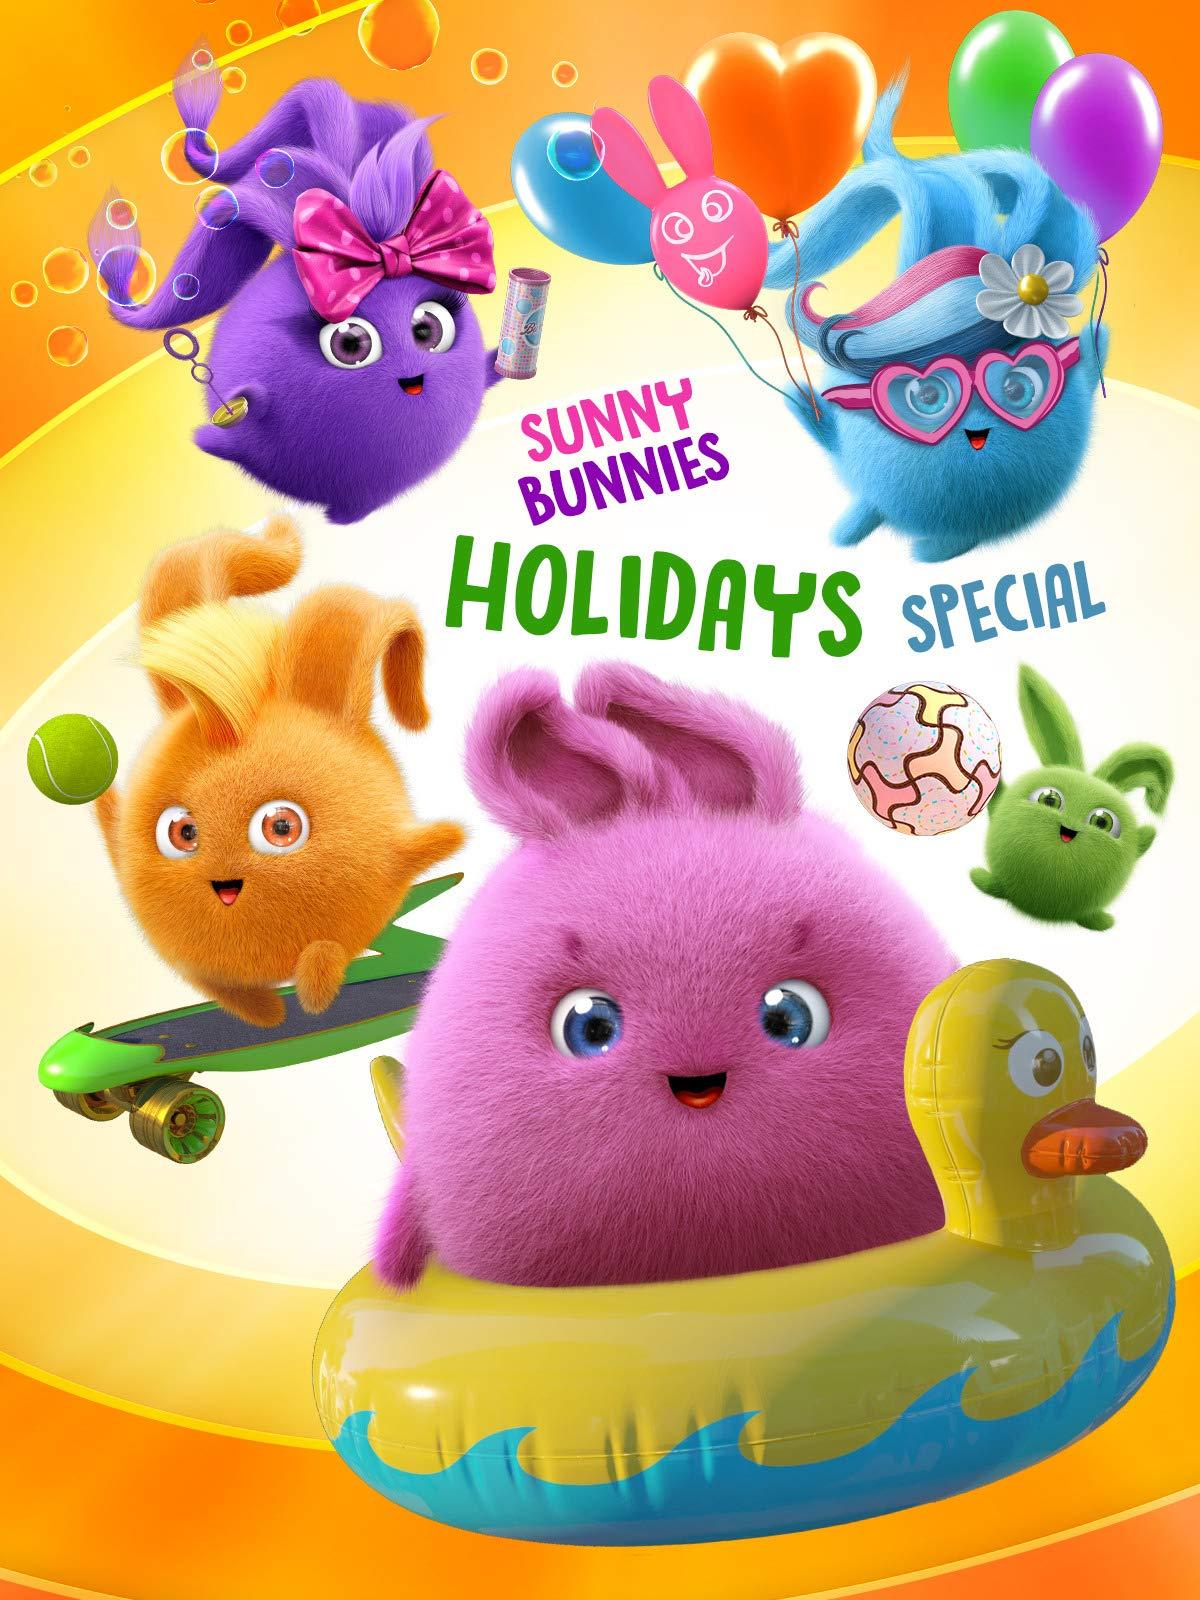 Sunny Bunnies - Holidays Special